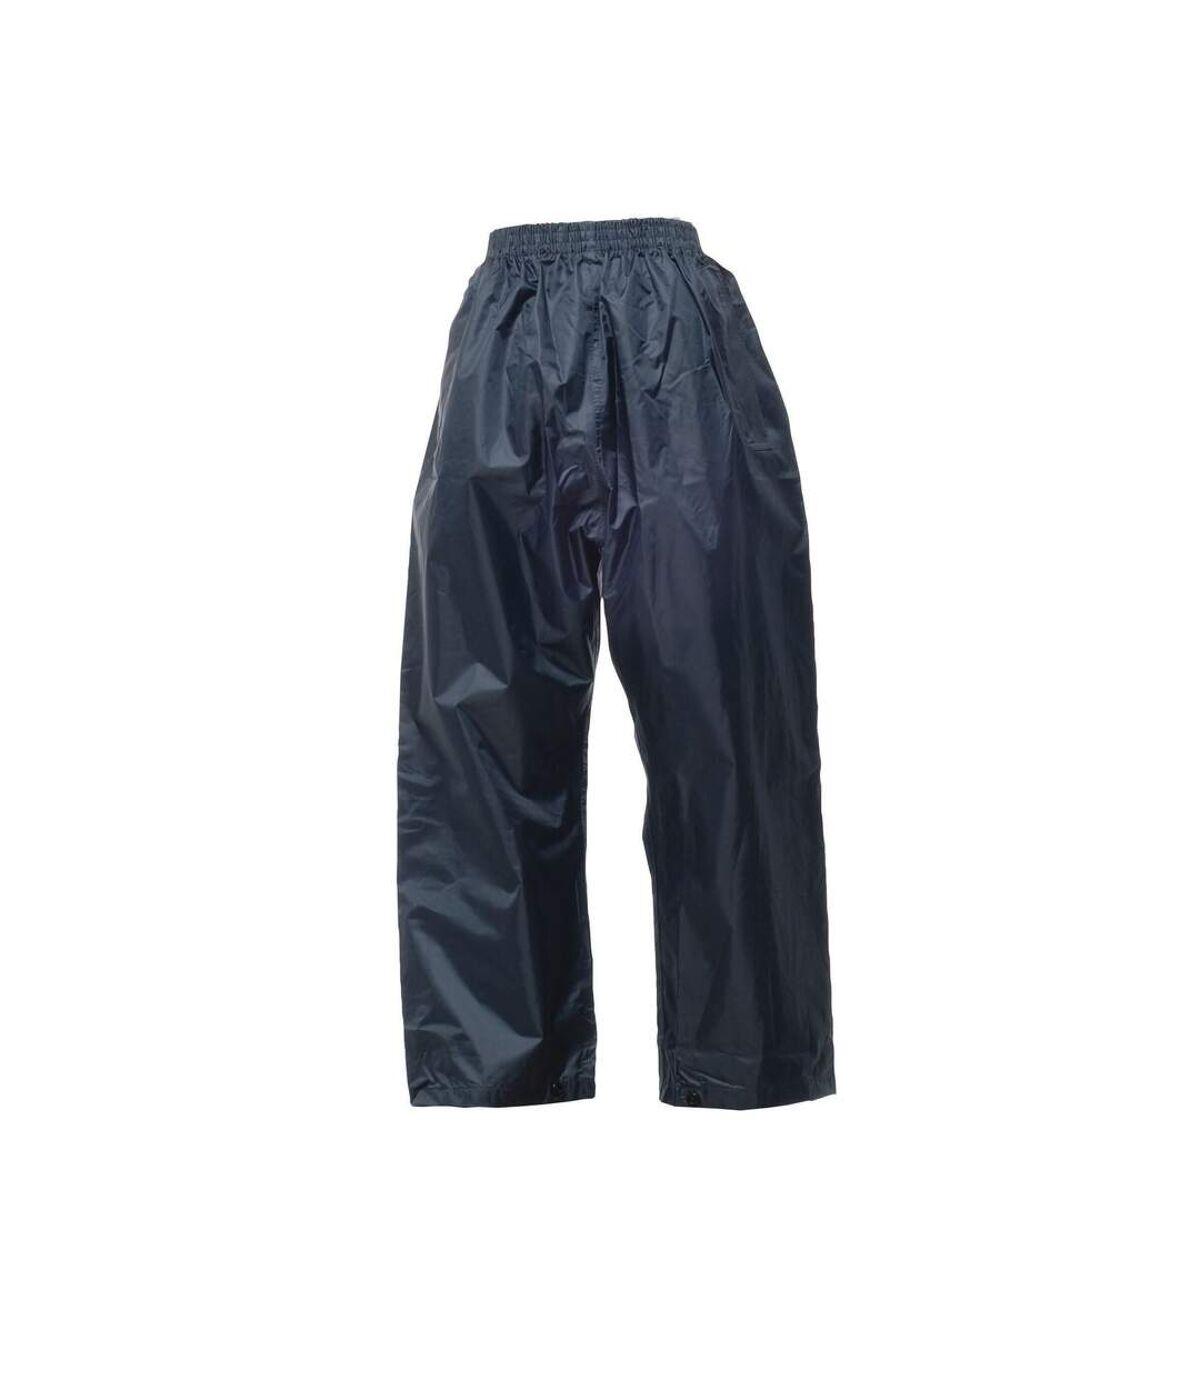 Regatta Professional Mens Pro Stormbreaker Waterproof Overtrousers (Navy) - UTRG2375